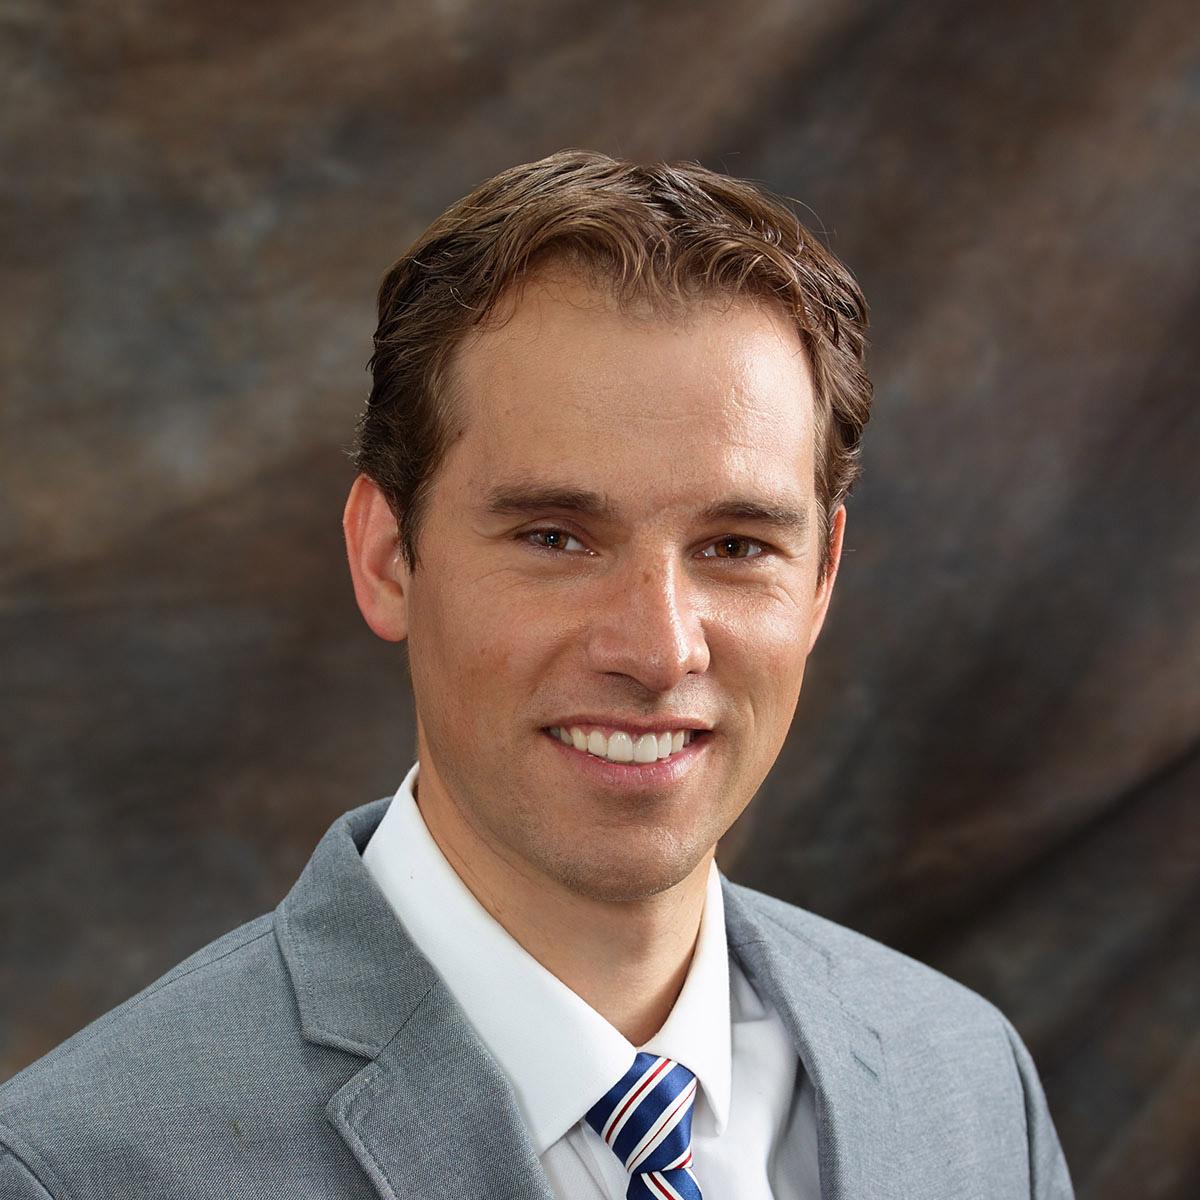 David R. Warnick, MD